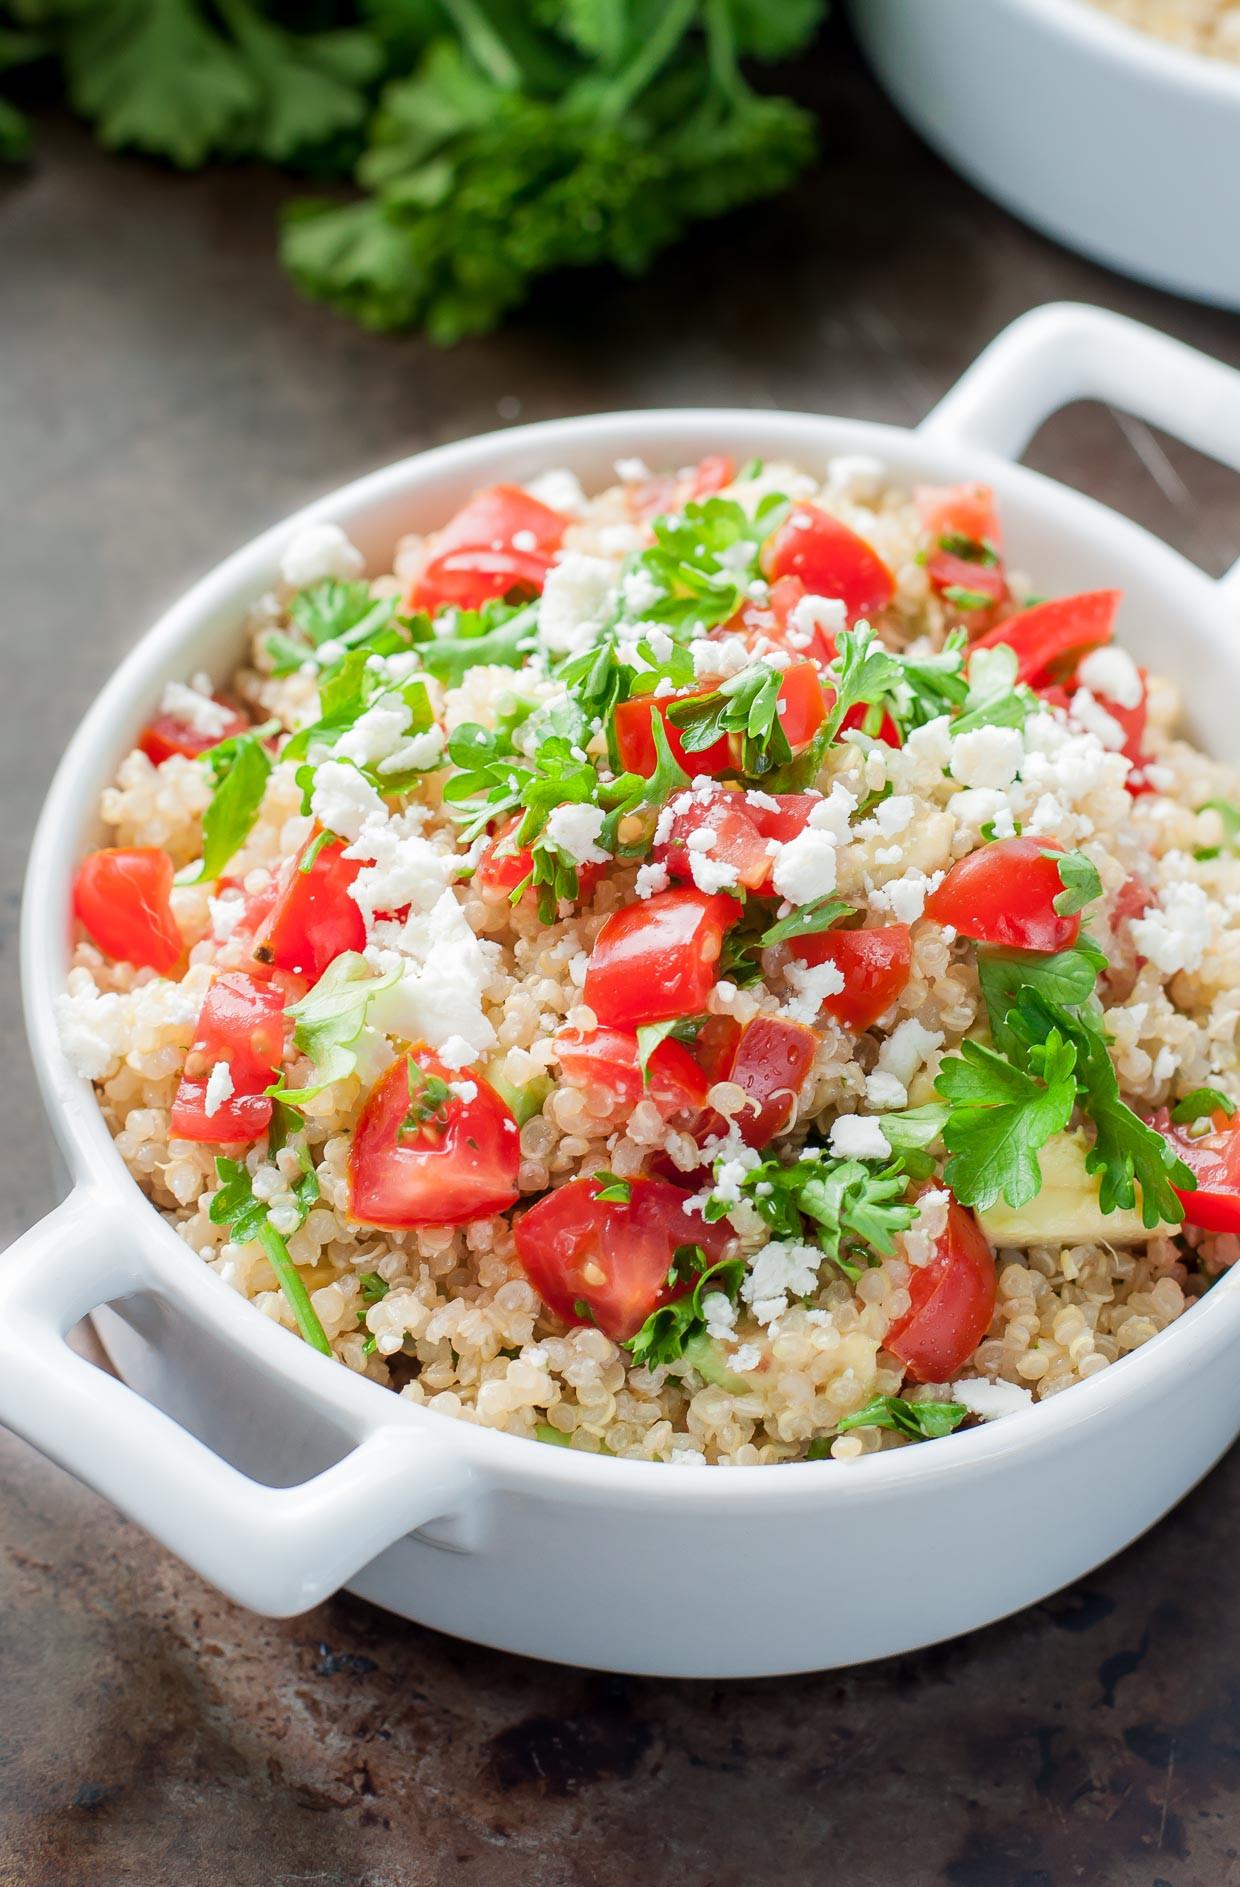 Quinoa Salad Recipes Healthy  Healthy Tomato Avocado Quinoa Salad with Feta